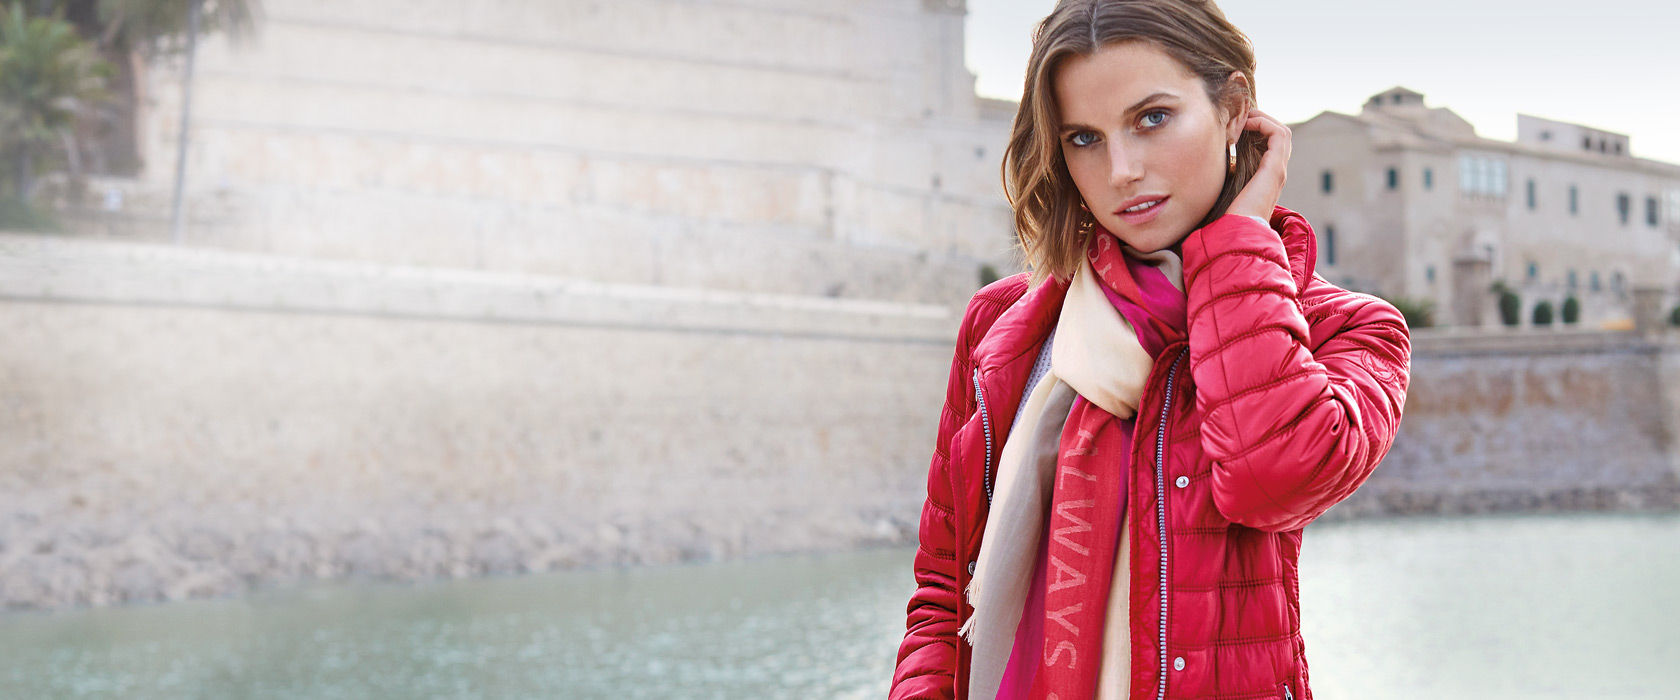 fashion style order reasonably priced Hochwertige Damenmode exklusiver Mode-Designer | peterhahn.de